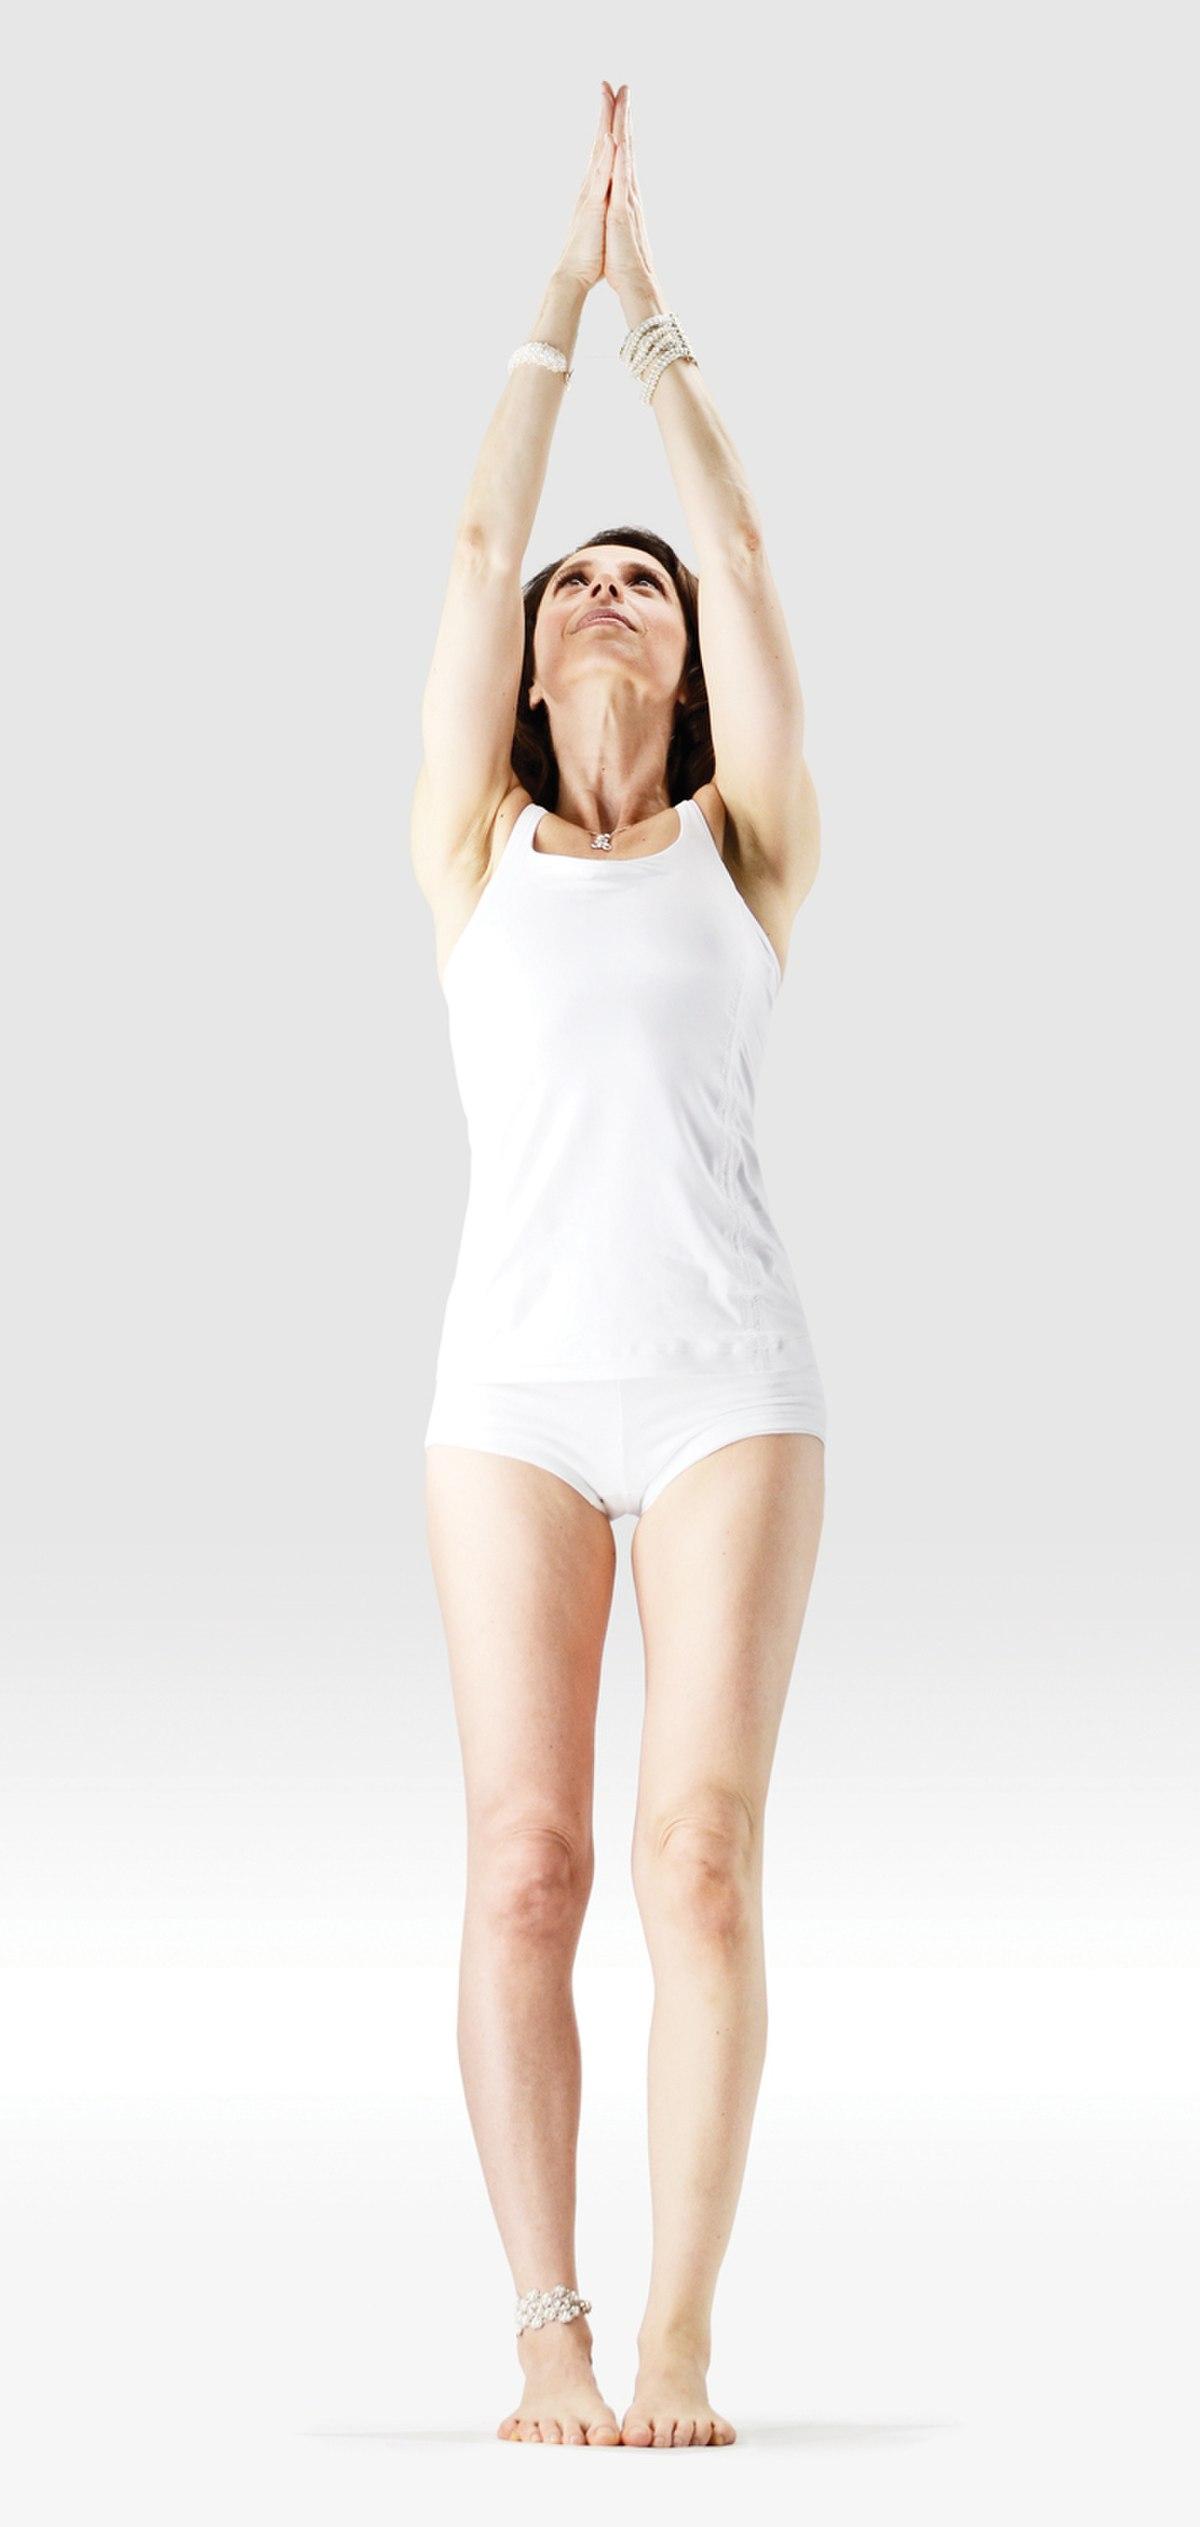 1200px-Mr-yoga-upward_salute_2.jpg